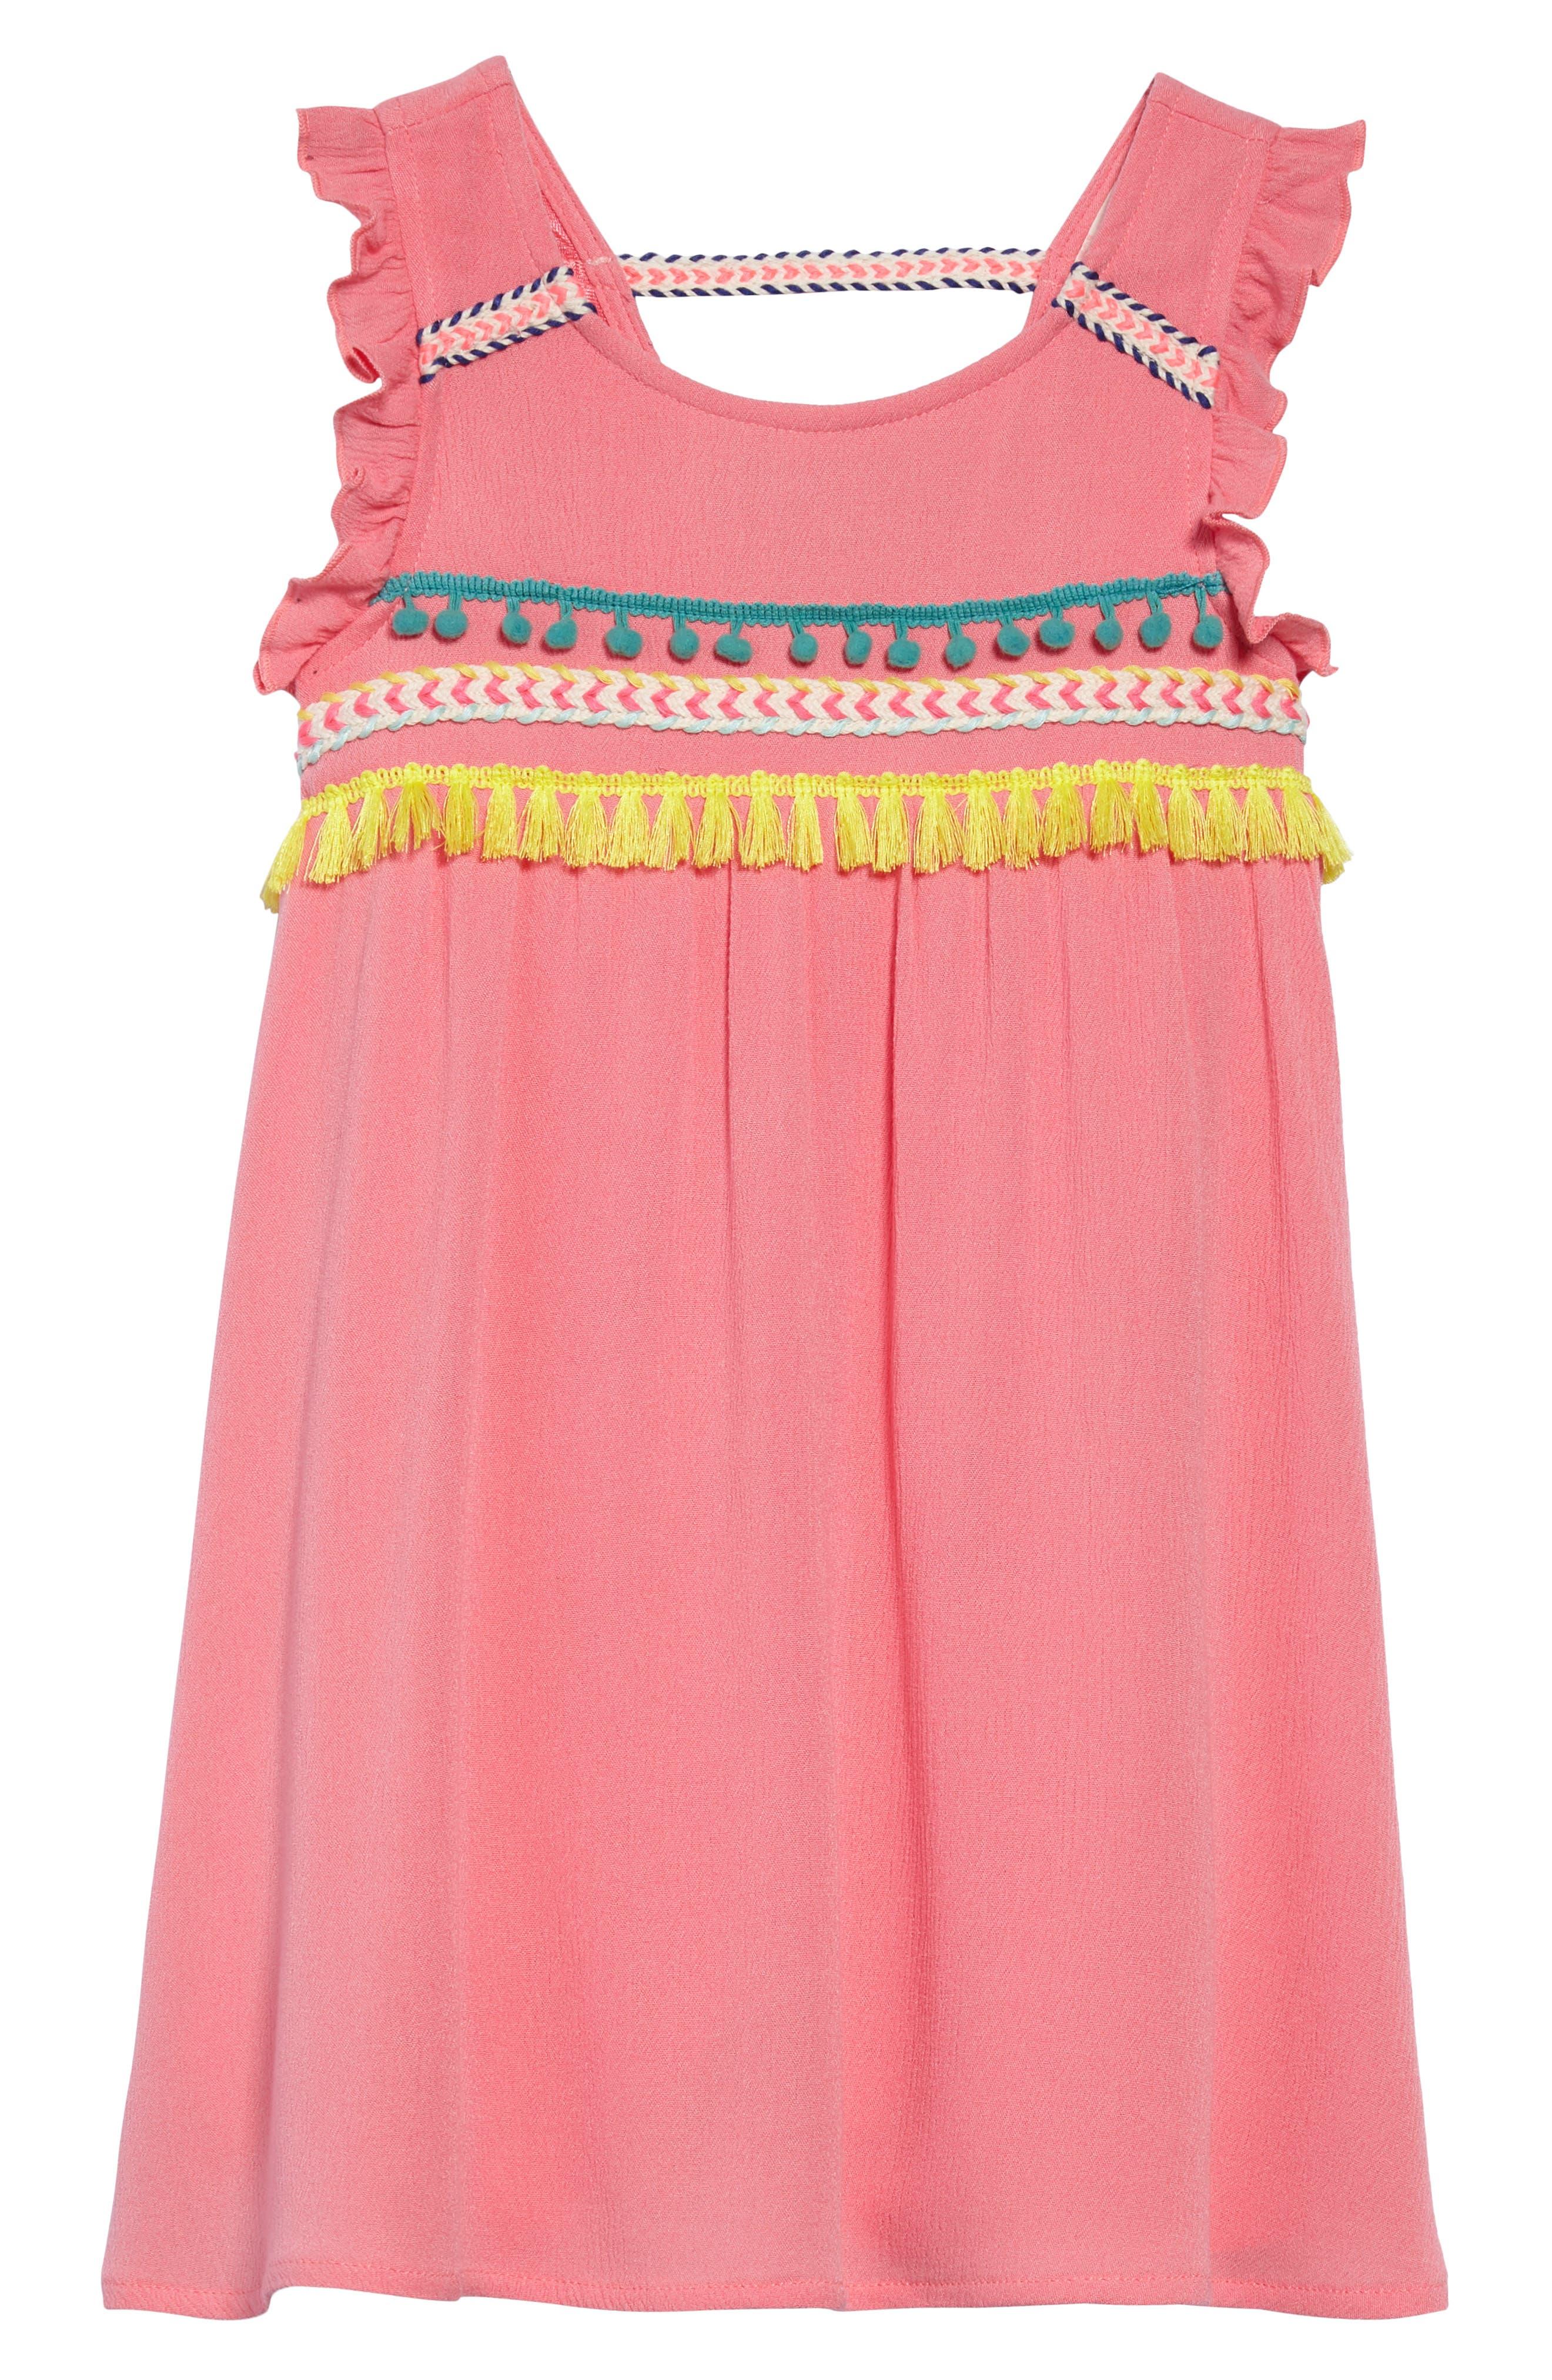 Trim Babydoll Dress,                             Main thumbnail 1, color,                             Coral